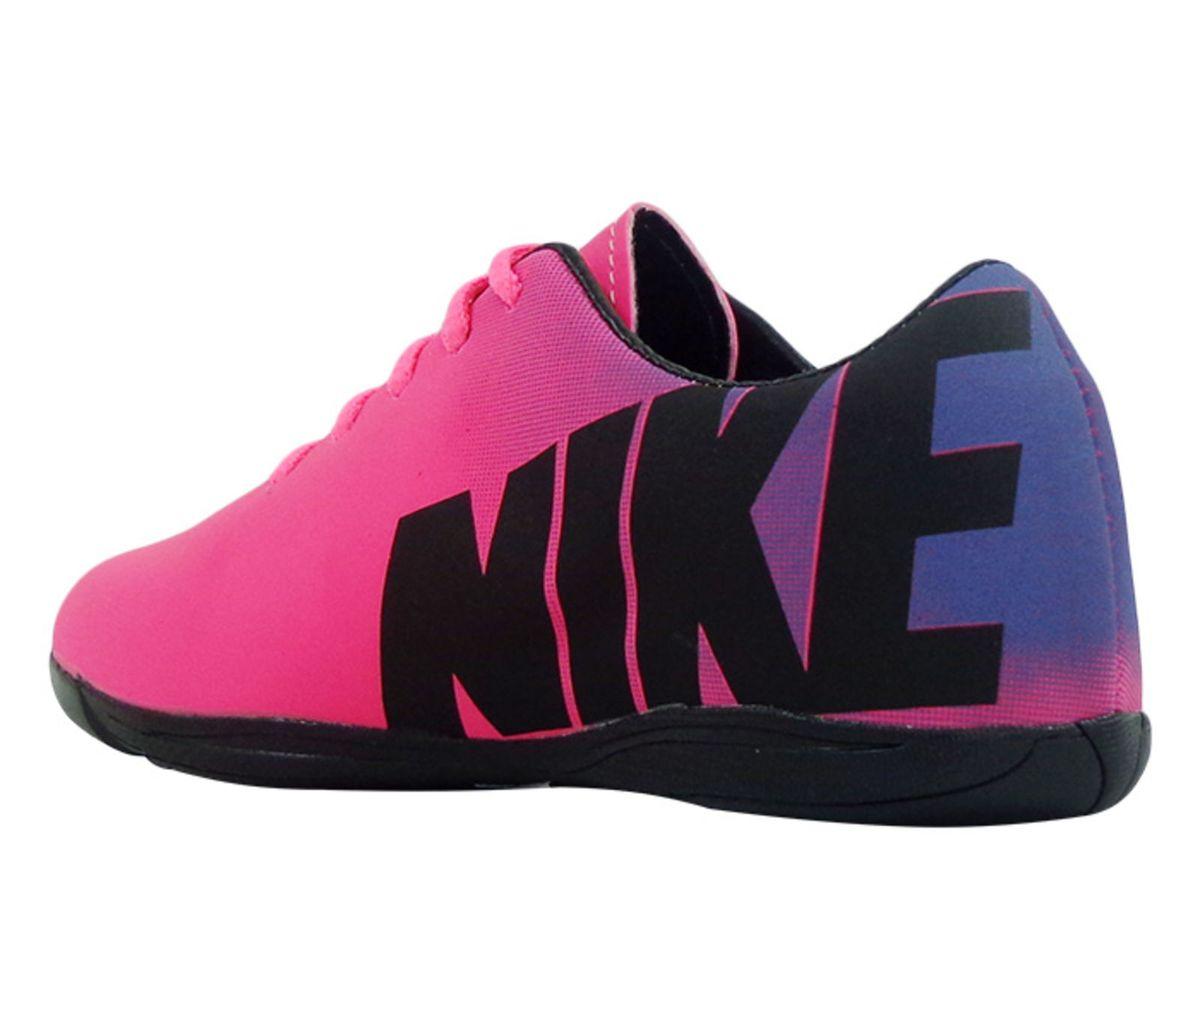 7047d43a4a Chuteira Futsal Nike MercurialX Superfly Academy Neymar Infantil